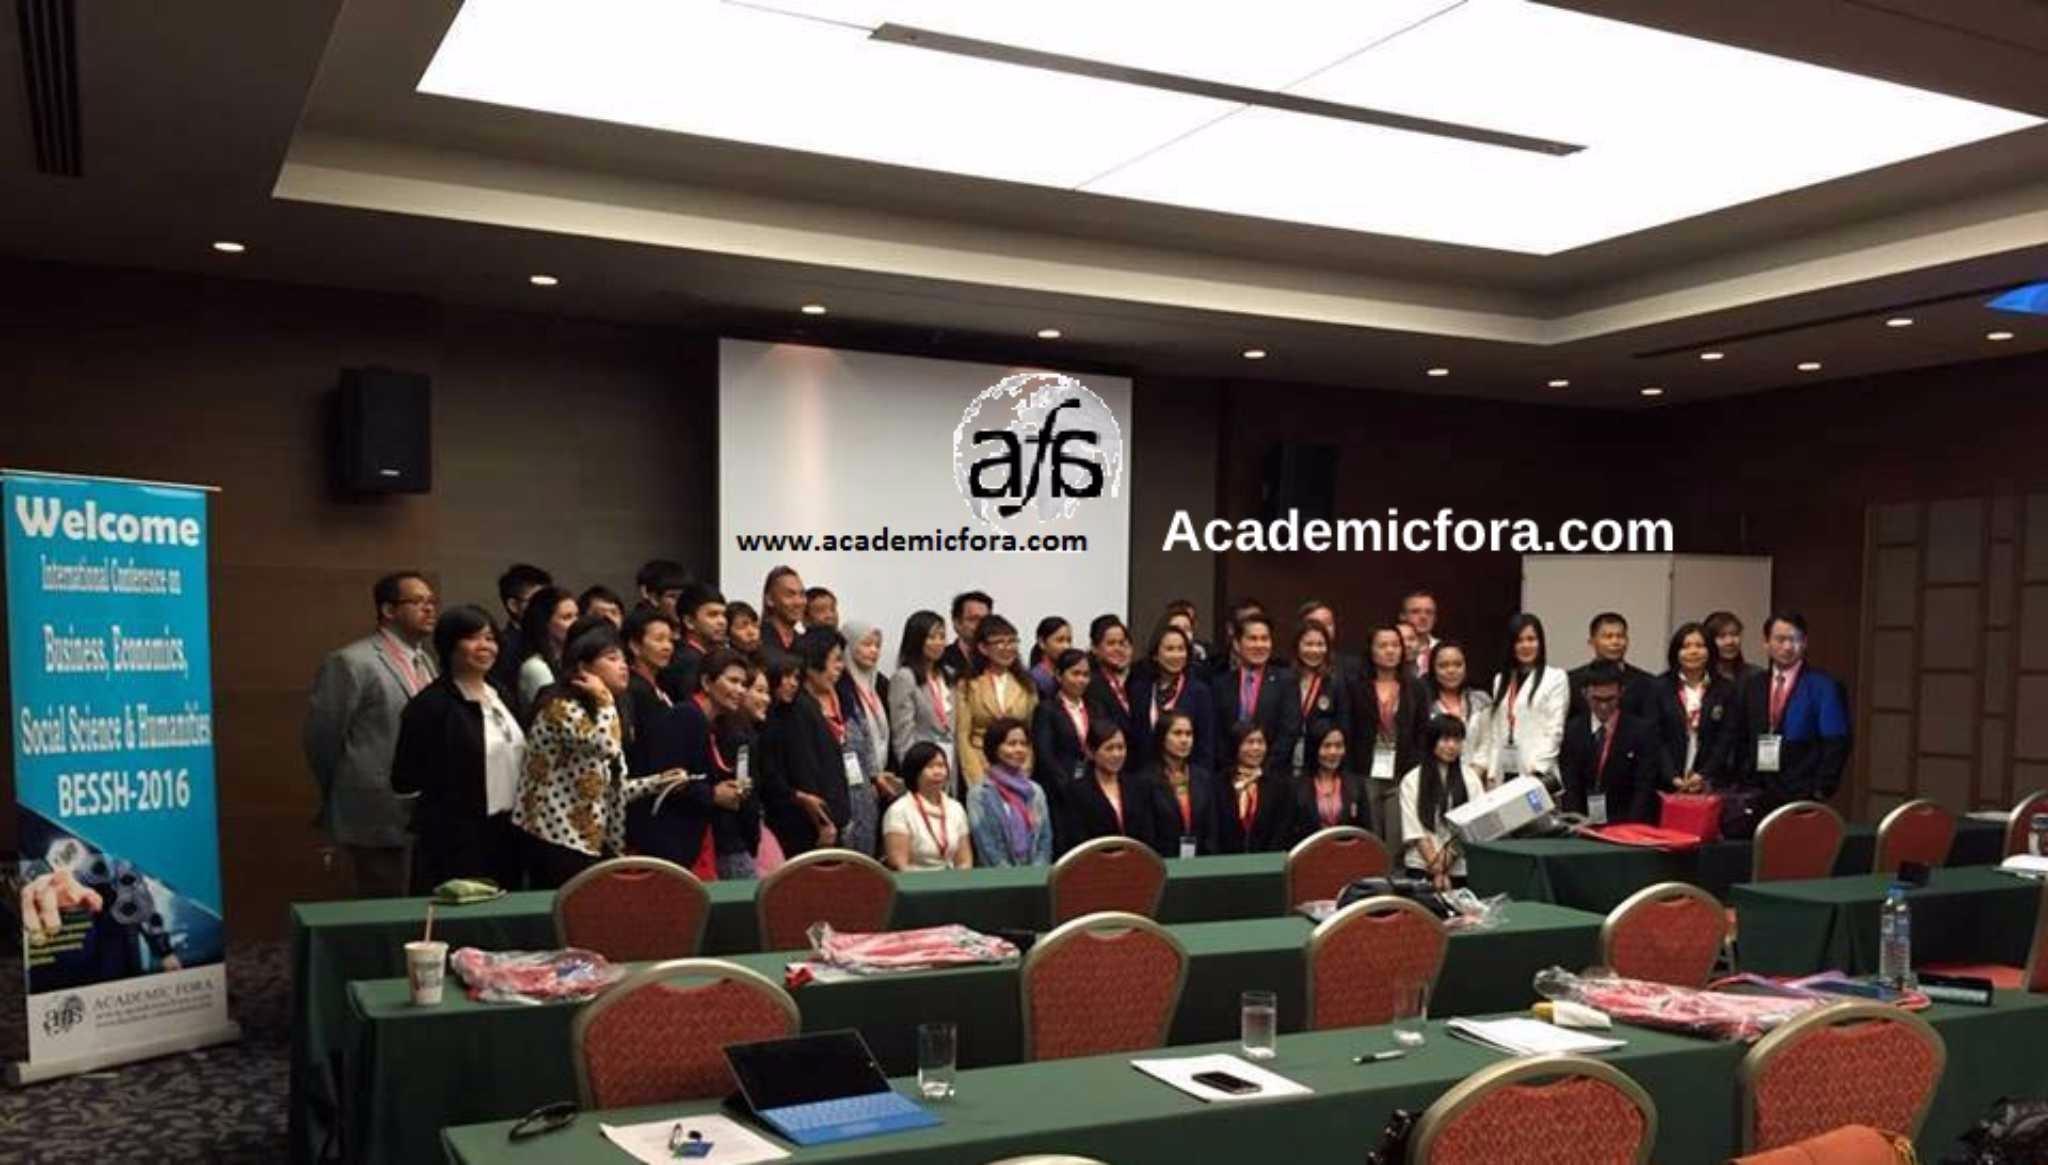 Academic (@academicfora) Cover Image